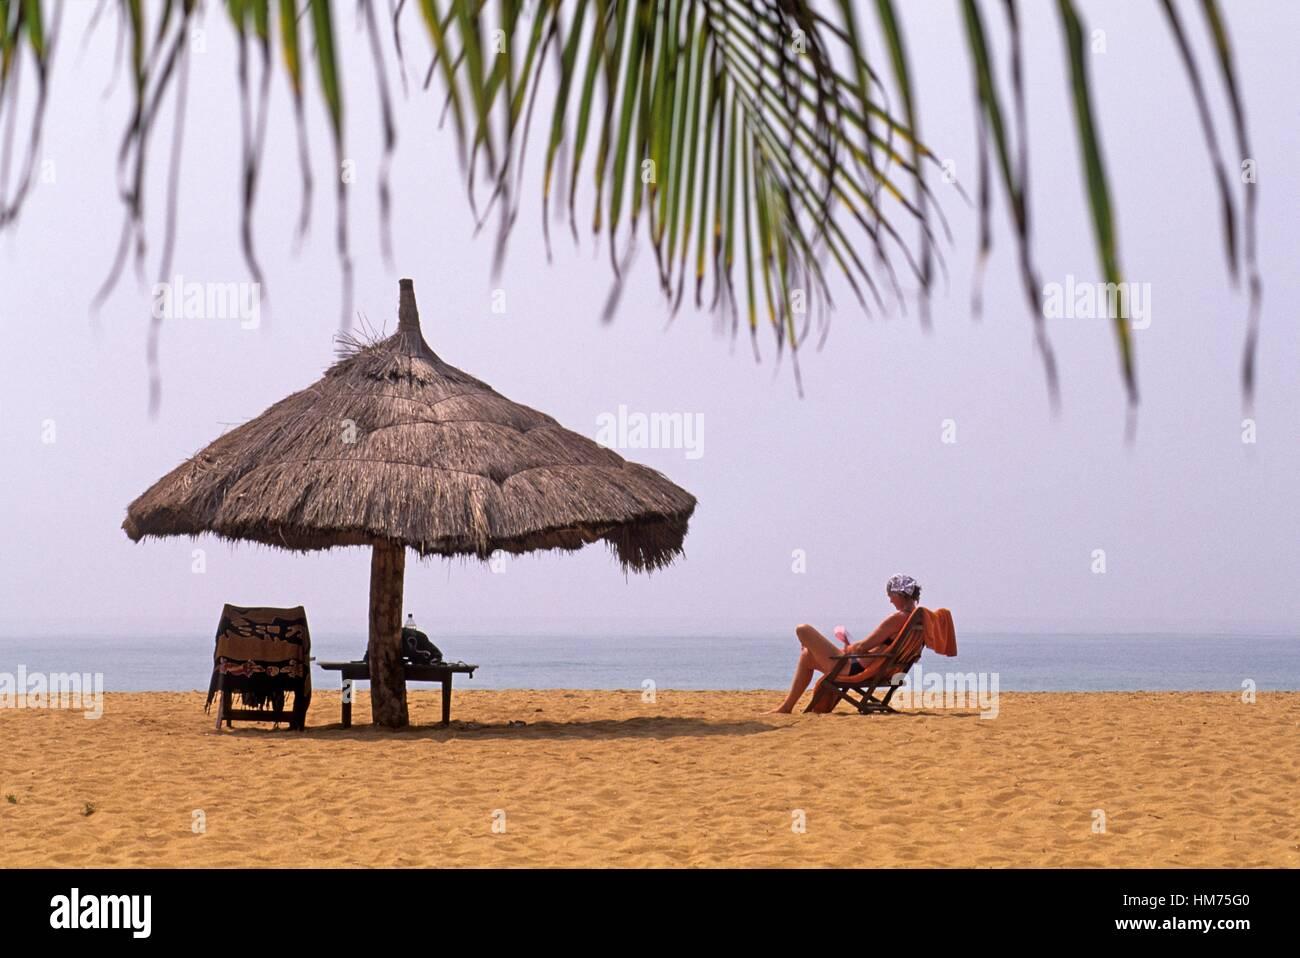 beach of Grand-Popo, Mono department, Benin, Africa. - Stock Image